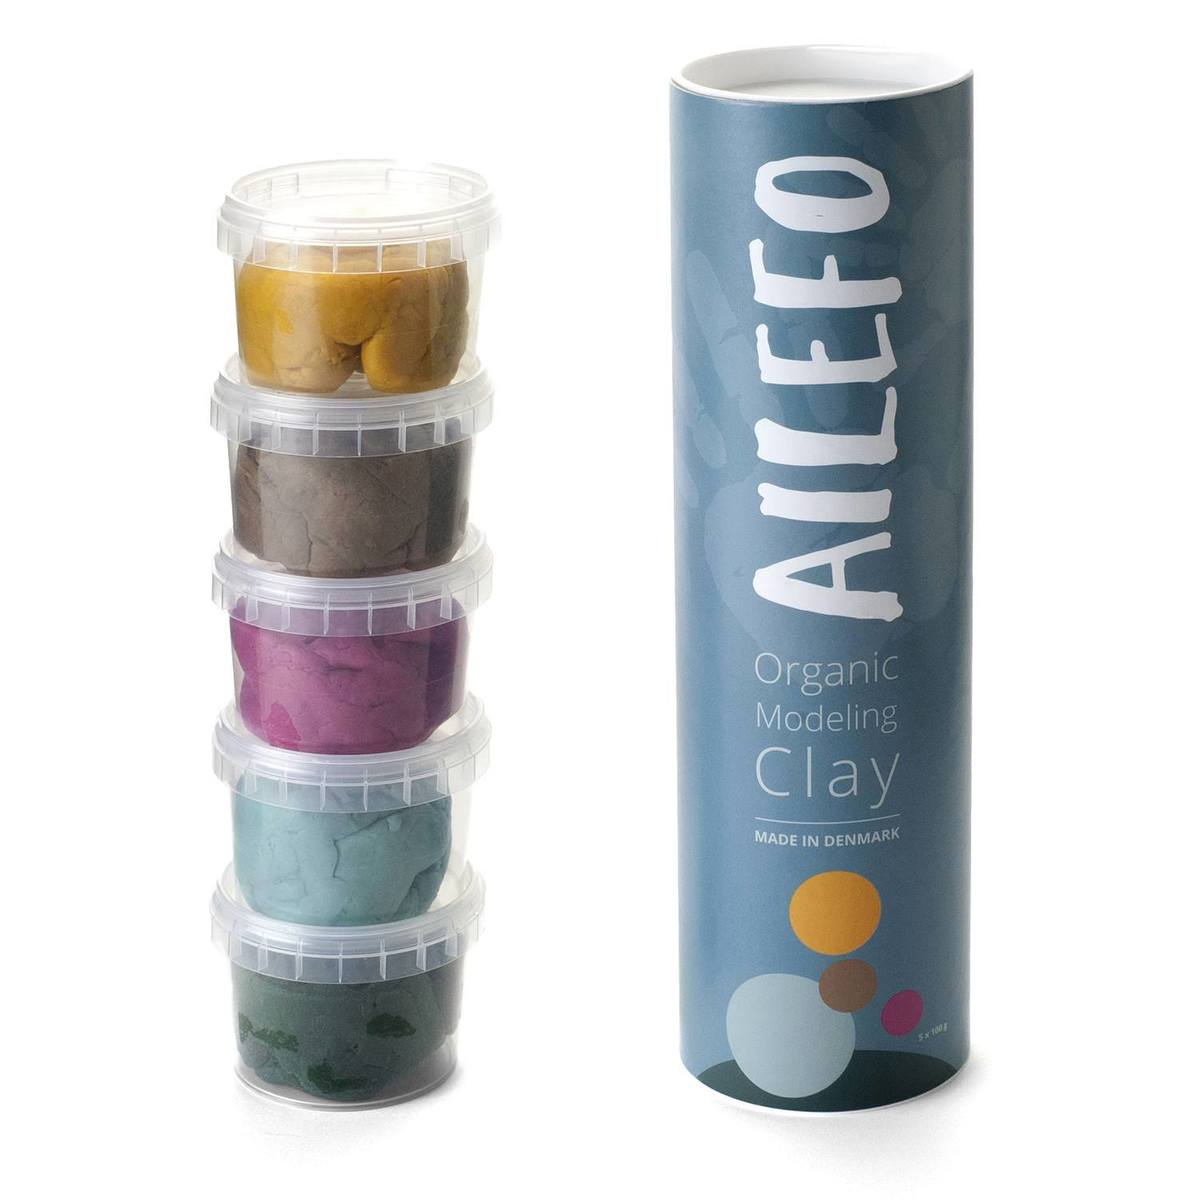 Ailefo Organic Modelling clay small tube